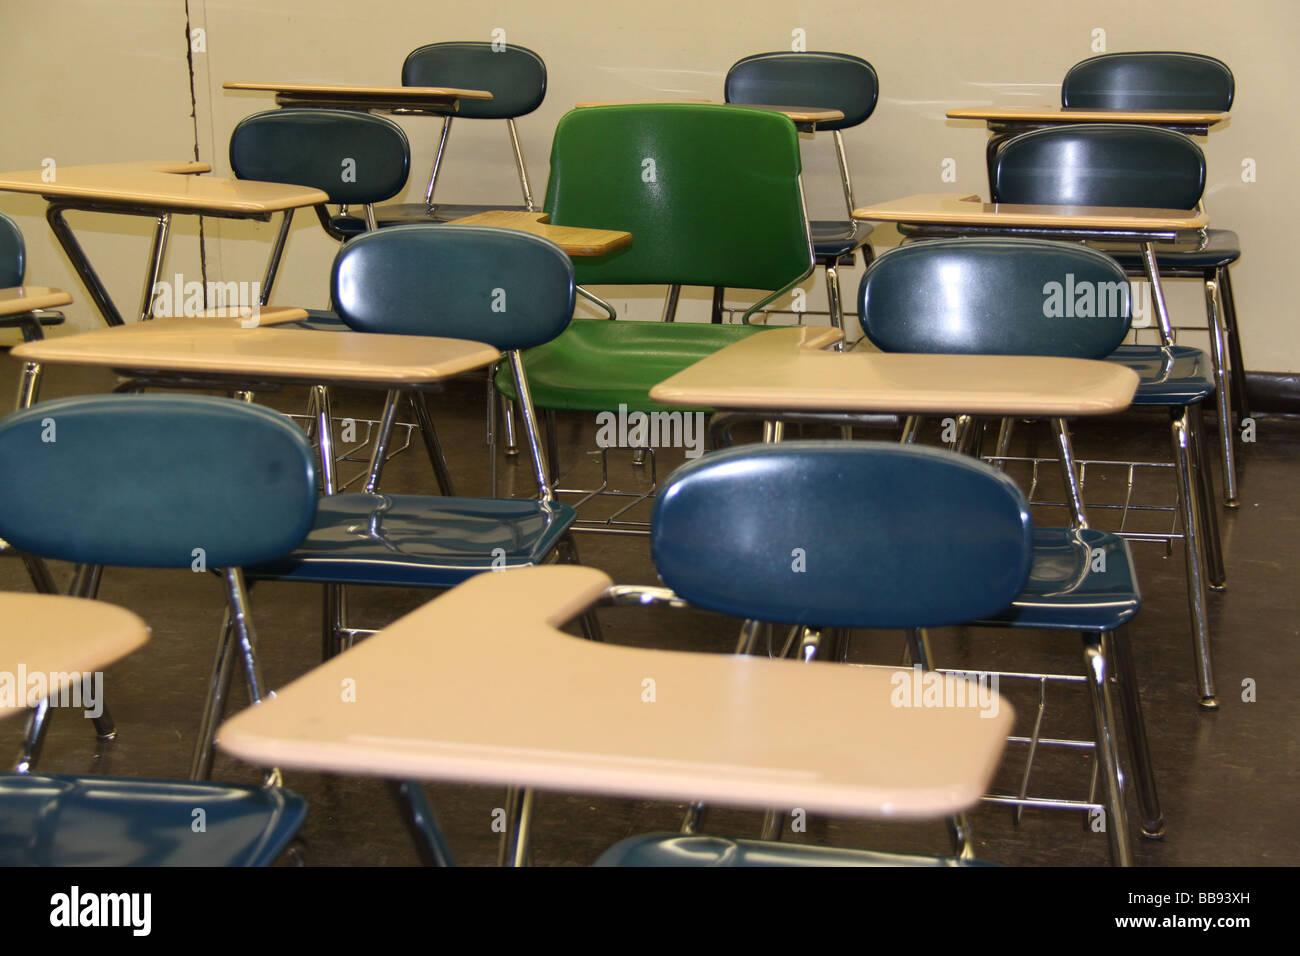 Empty school classroom with desks Stock Photo: 24172249 - Alamy